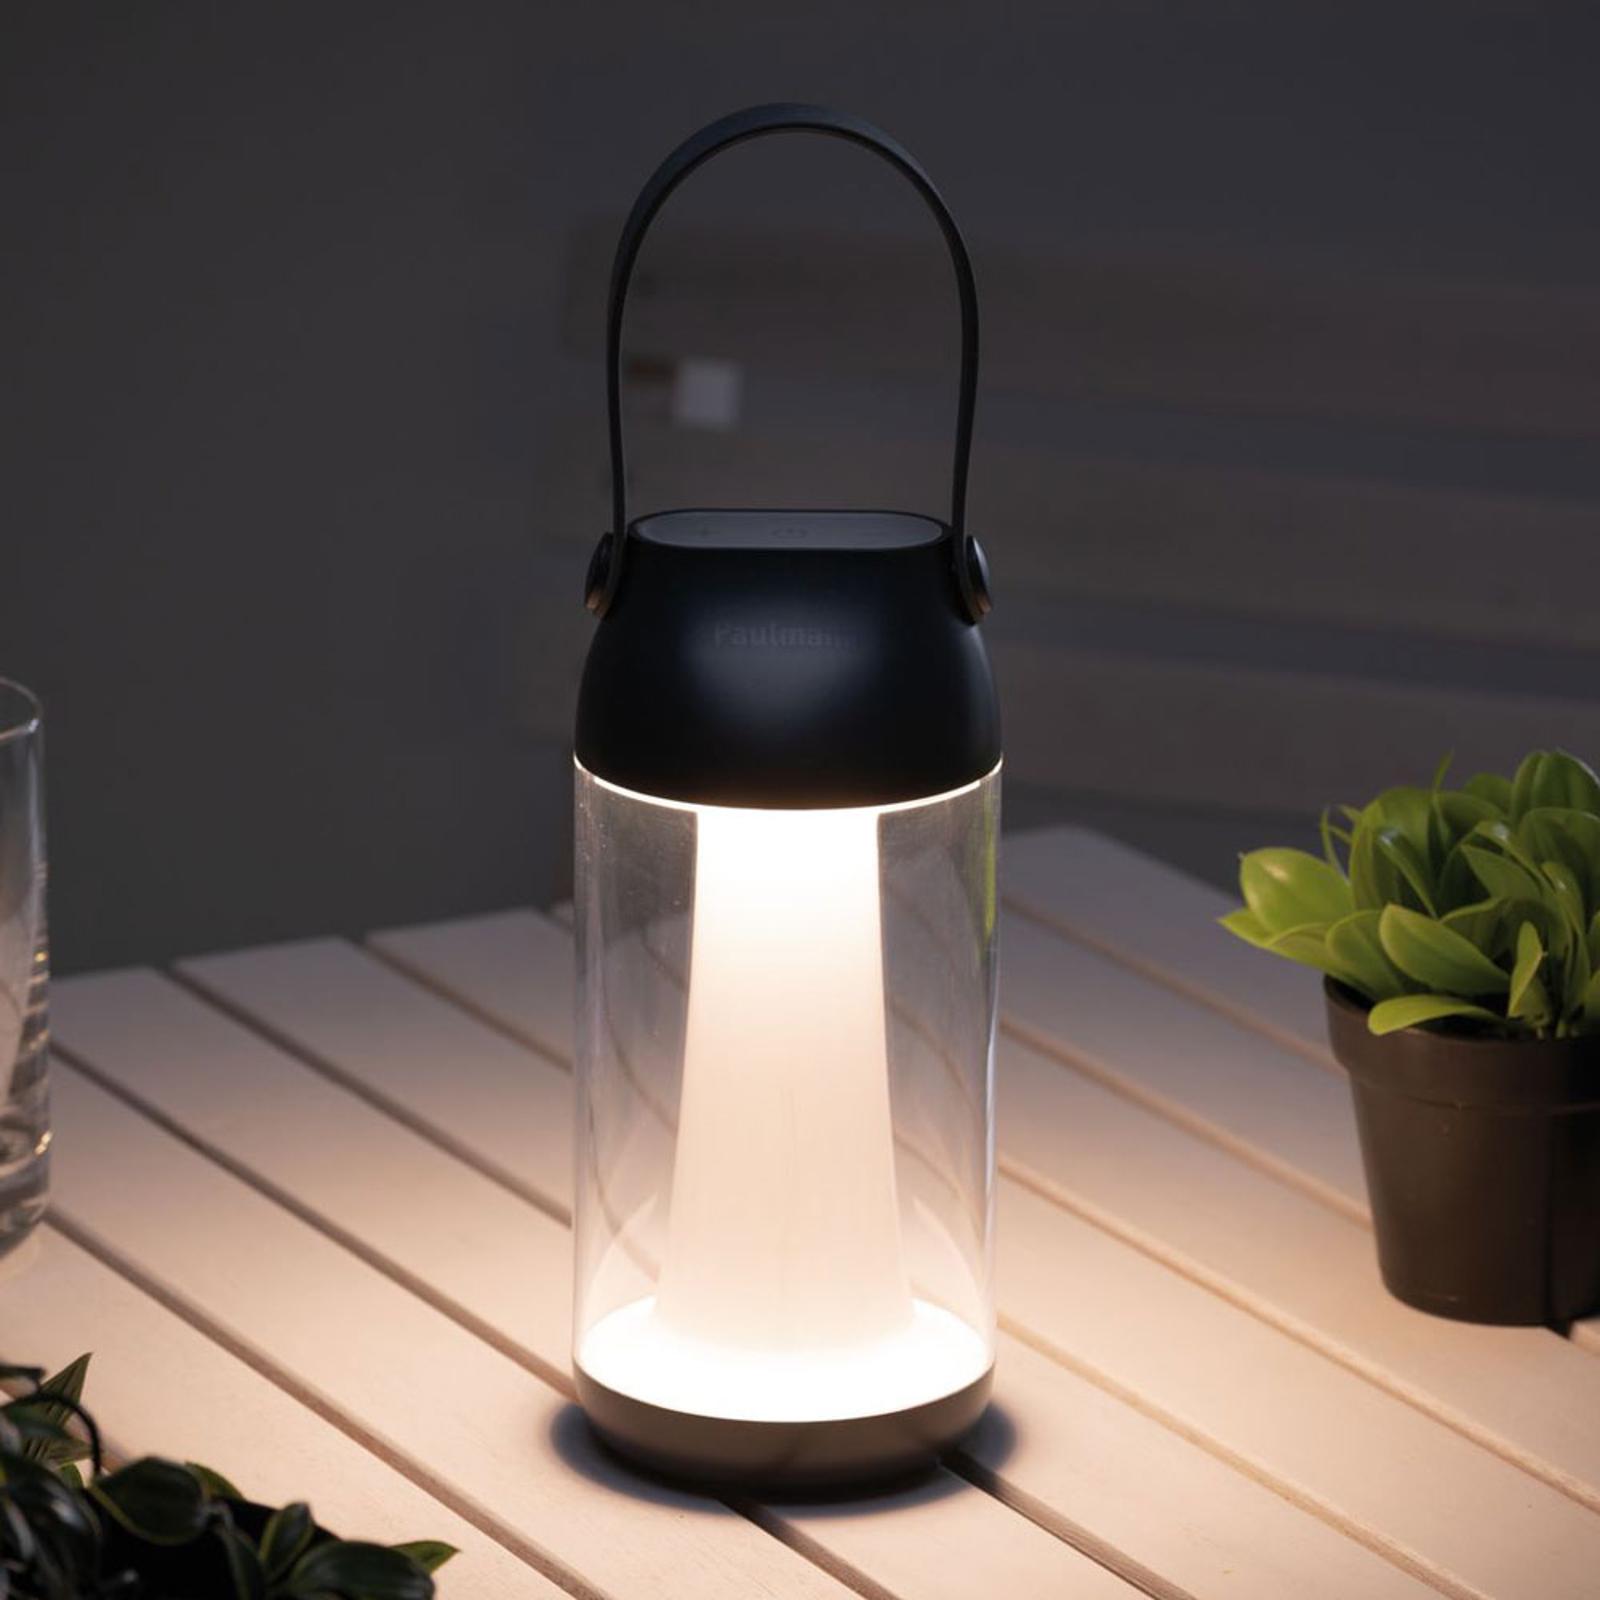 Paulmann LED-Campingleuchte Capulino